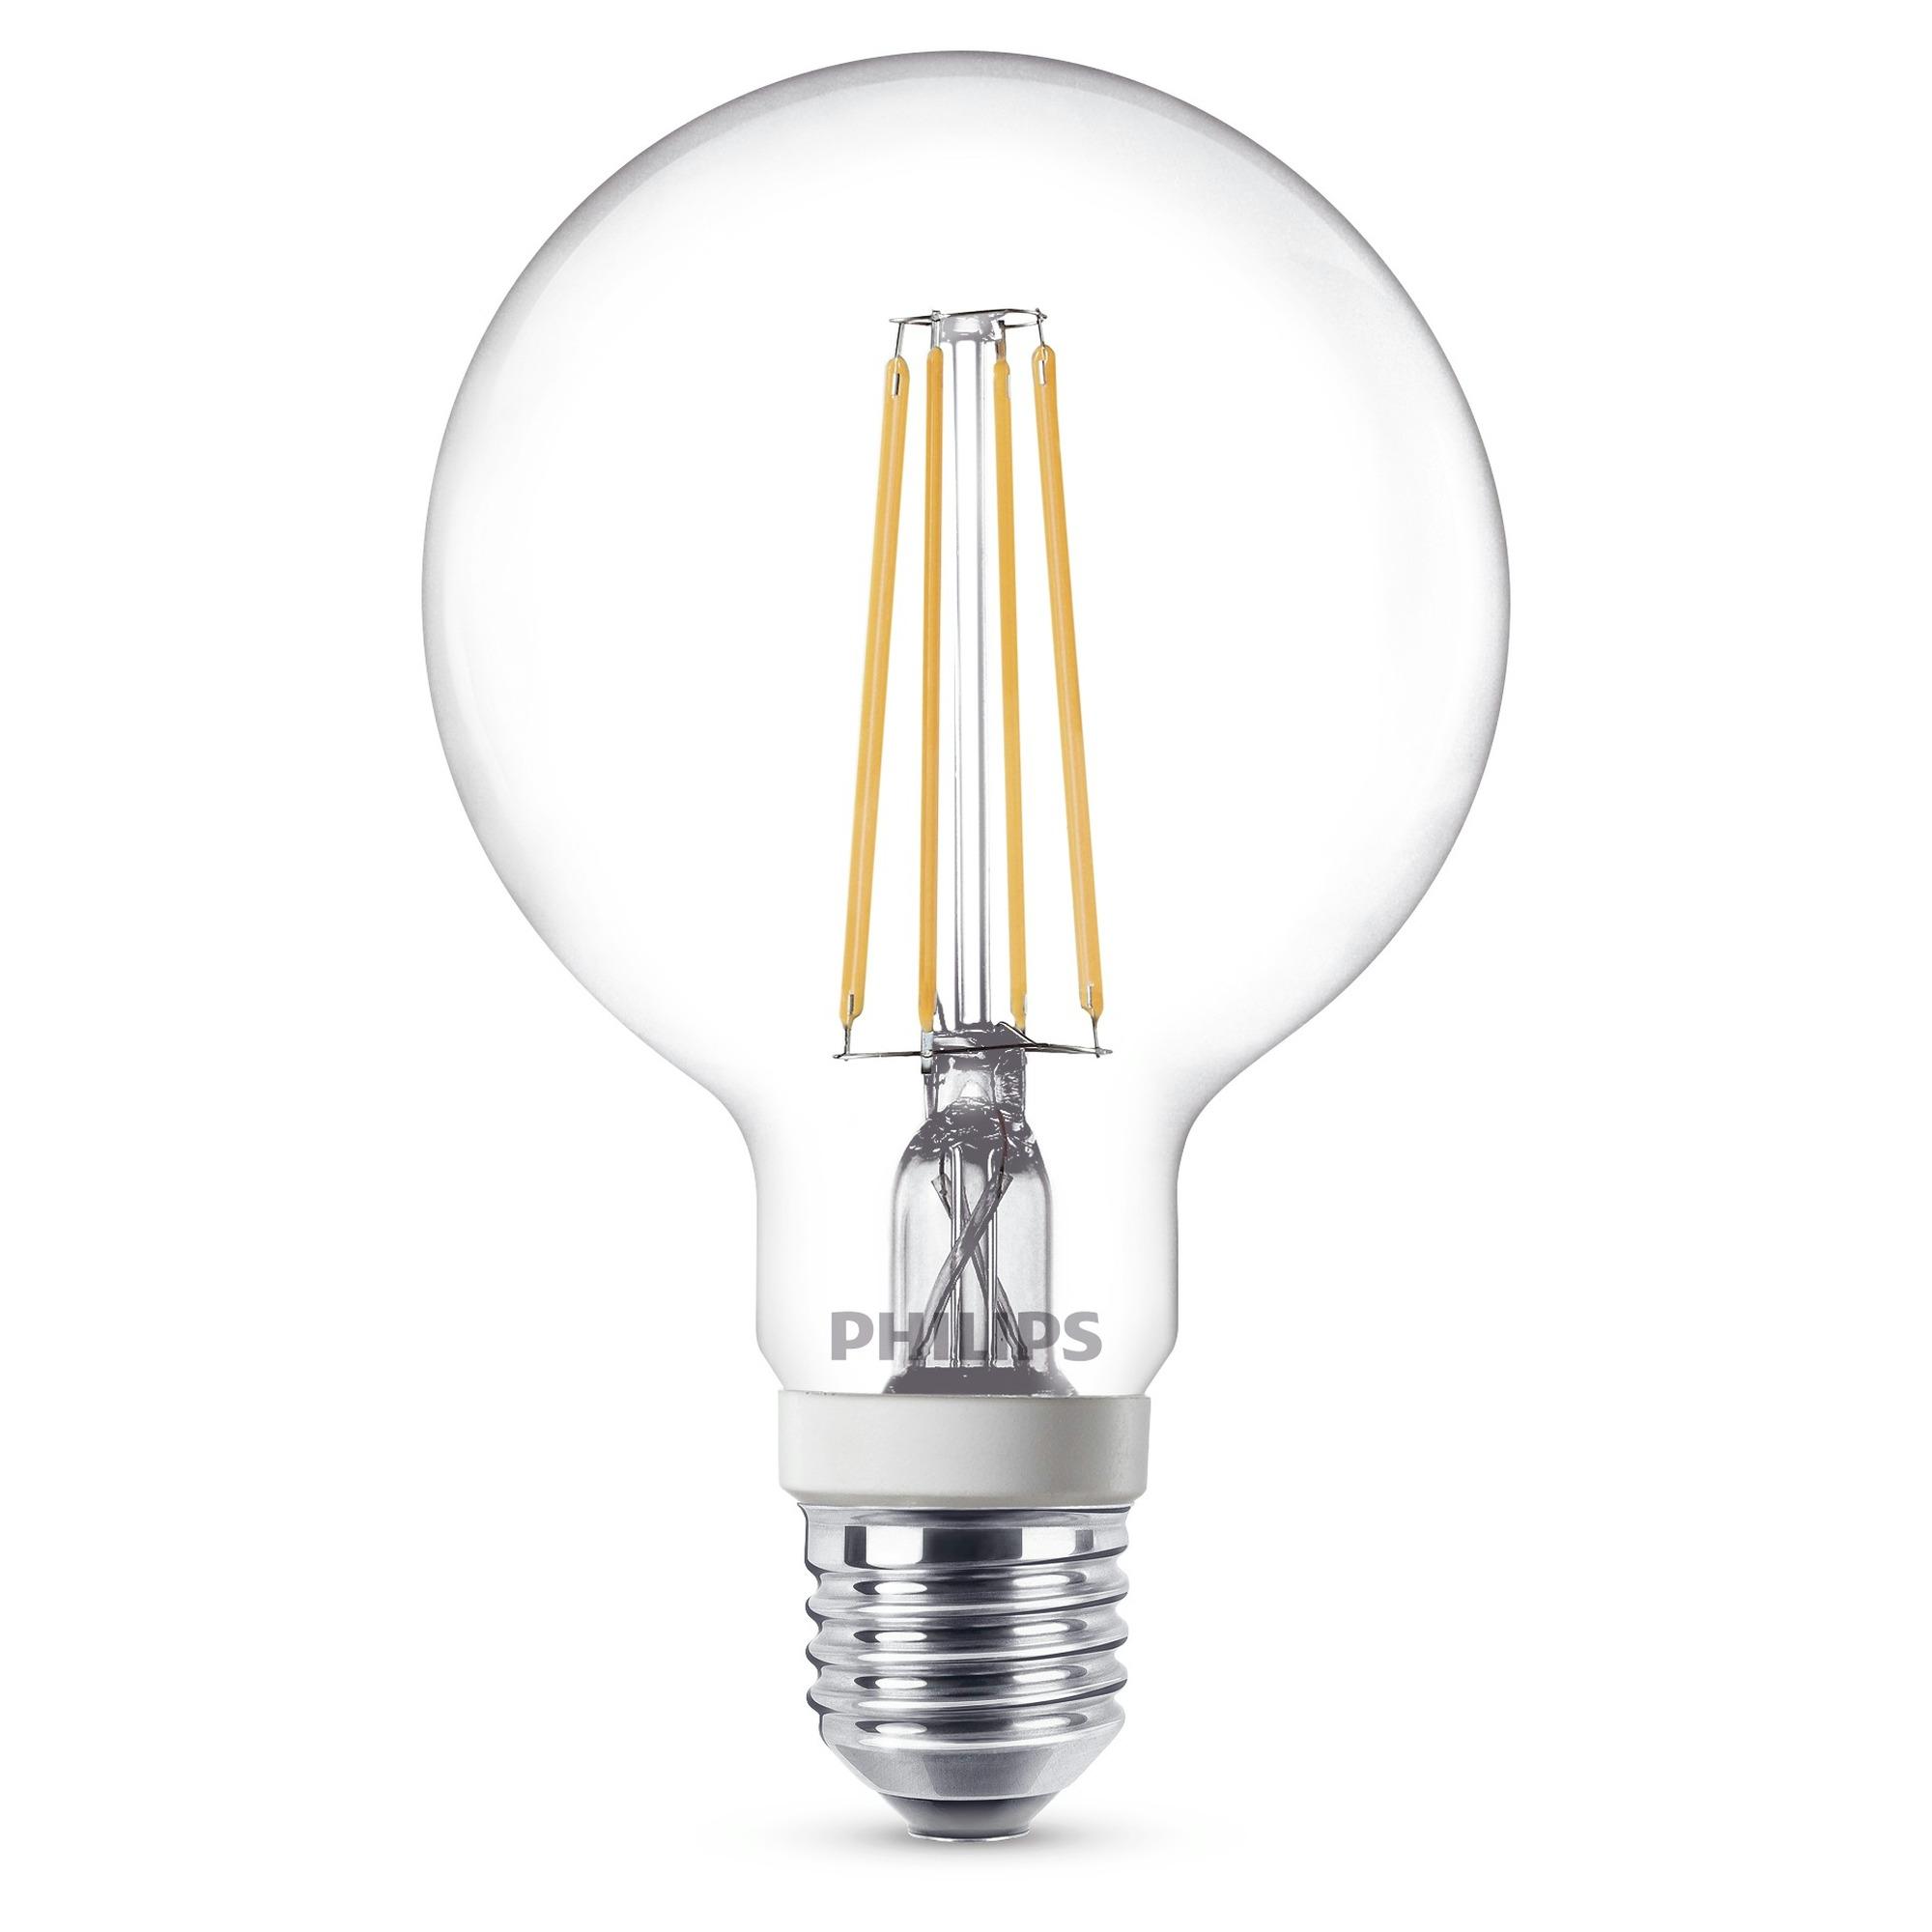 Philips LED-lamp Dimbaar, Filament-Retro-LED E27 Warmwit 7 W = 60 W Peer 1 stuks